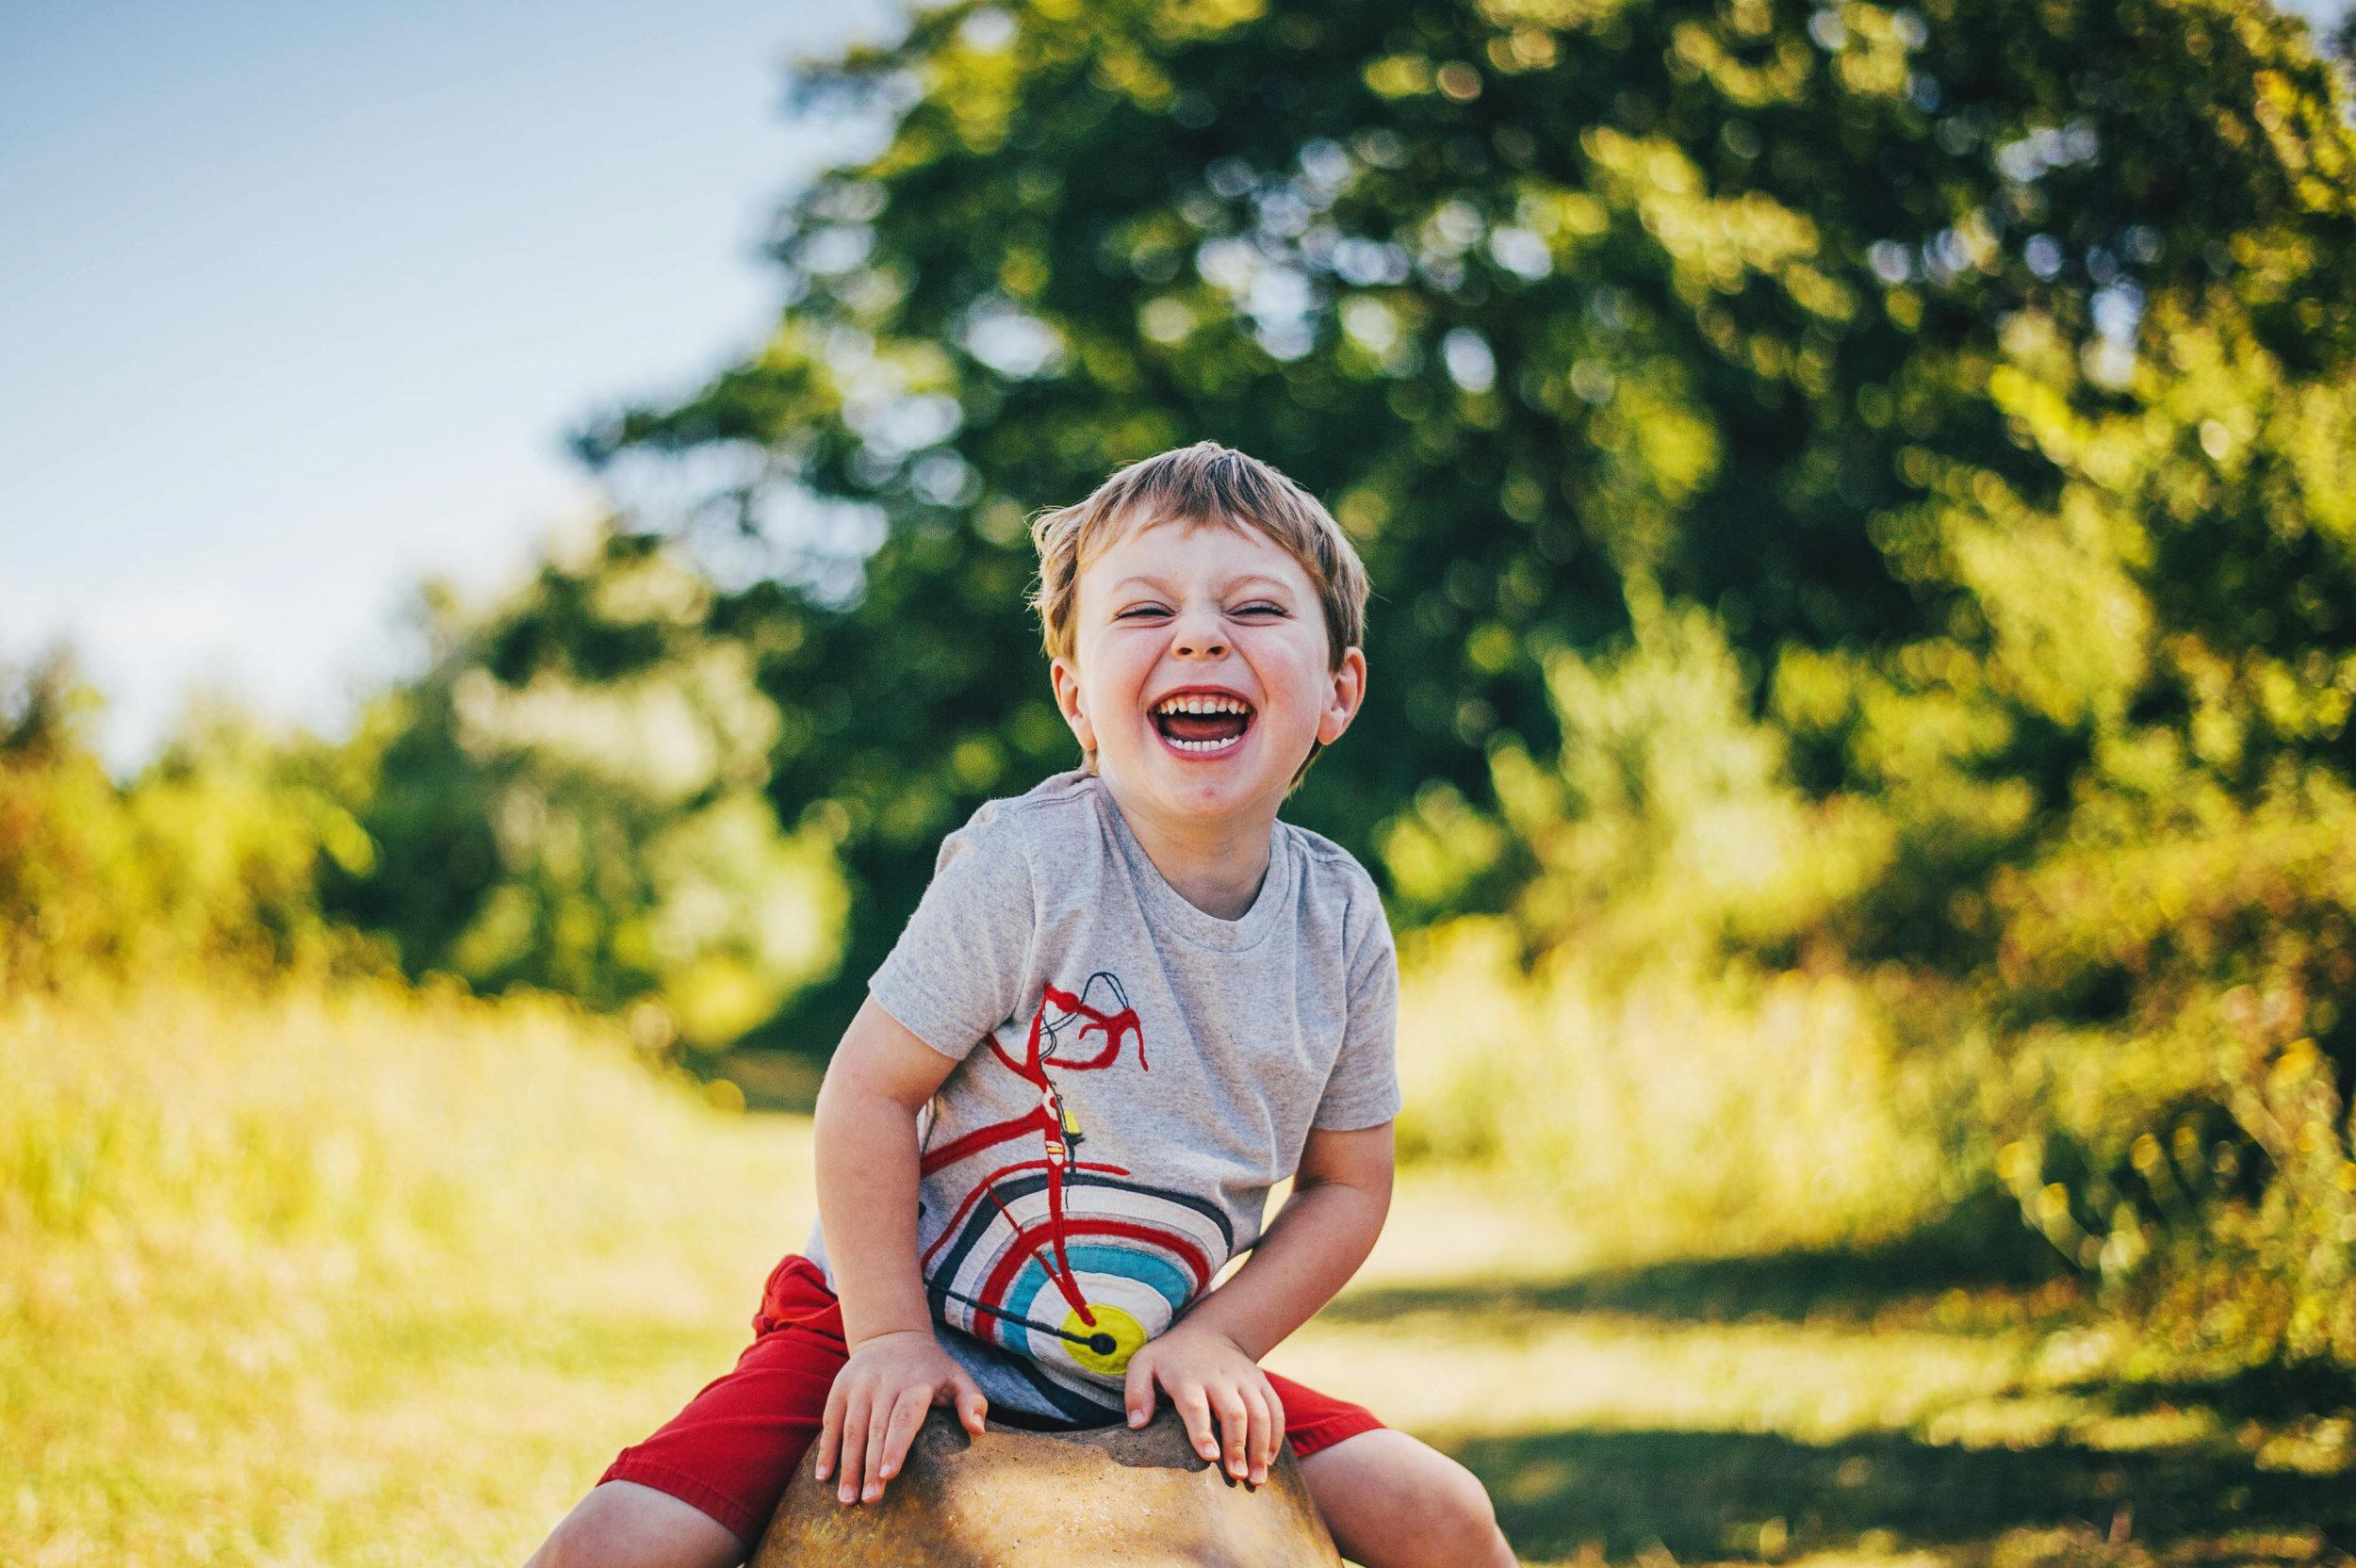 Little boy laughs in sunny park Essex UK Documentary Natural Portrait Photographer